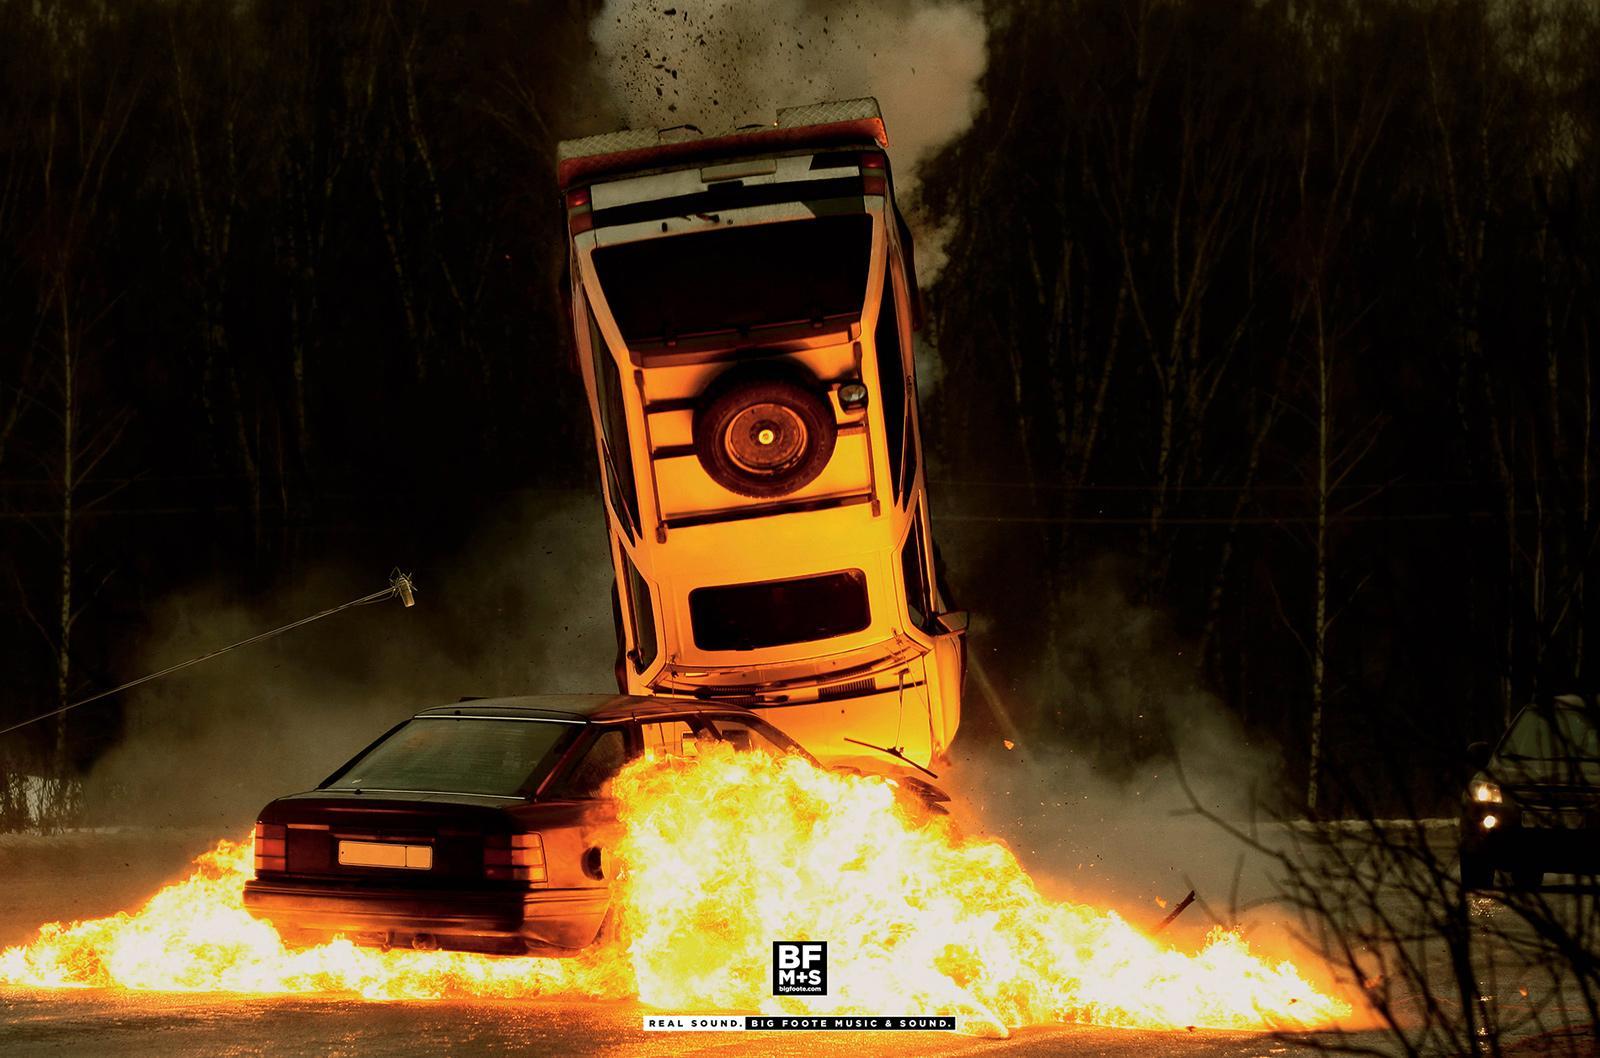 Big Foote Music & Sound Print Ad -  Car explosion